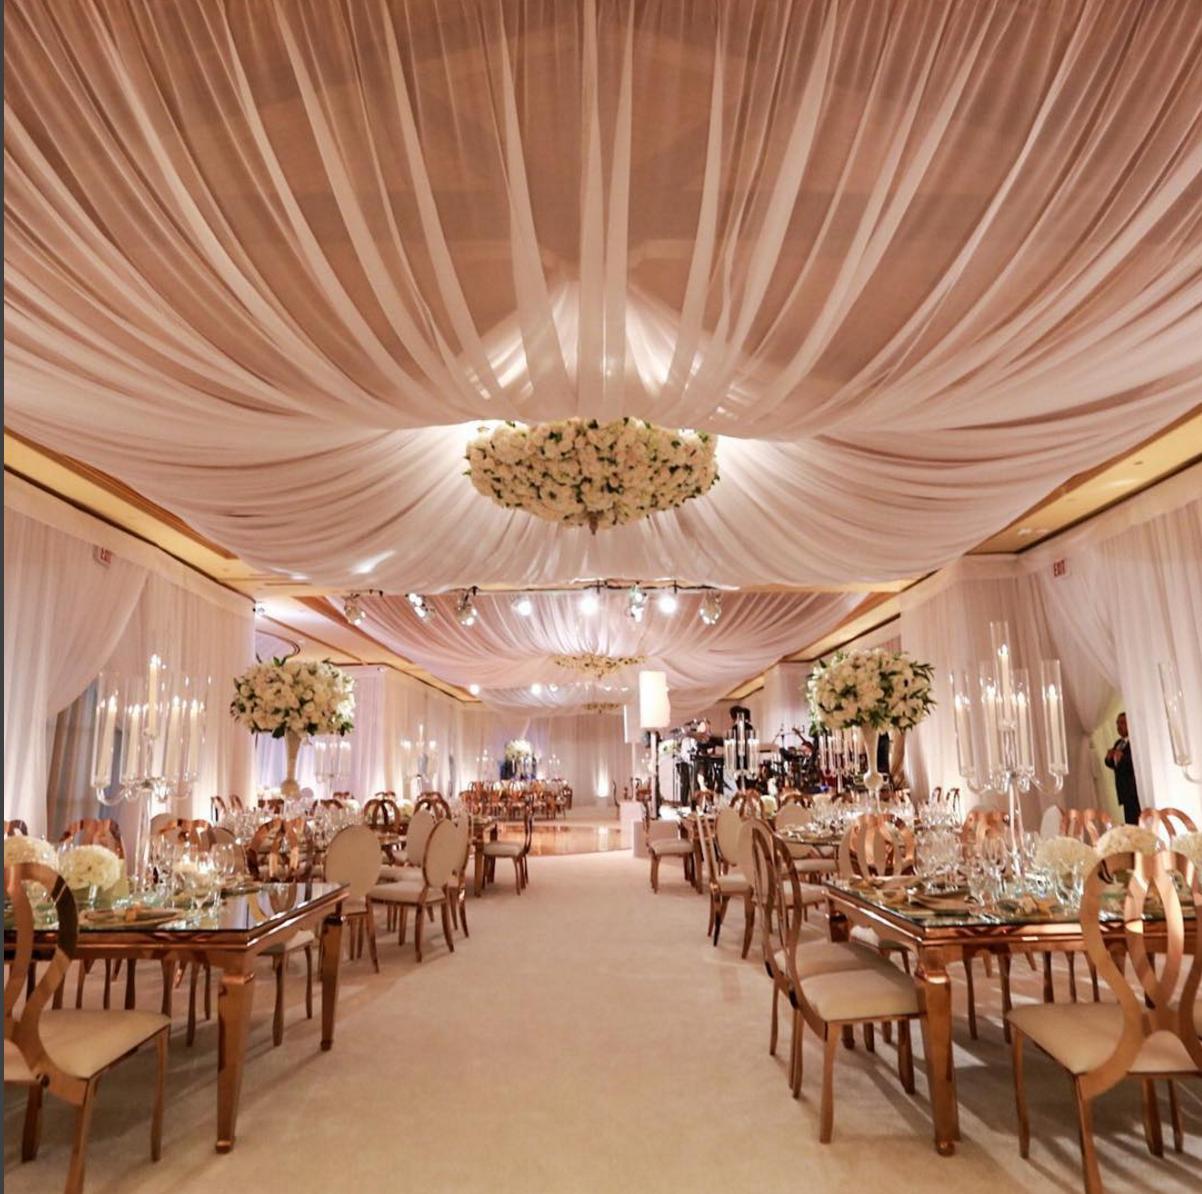 Bloom Box Designs Wedding Reception Indoor Wedding Draping The